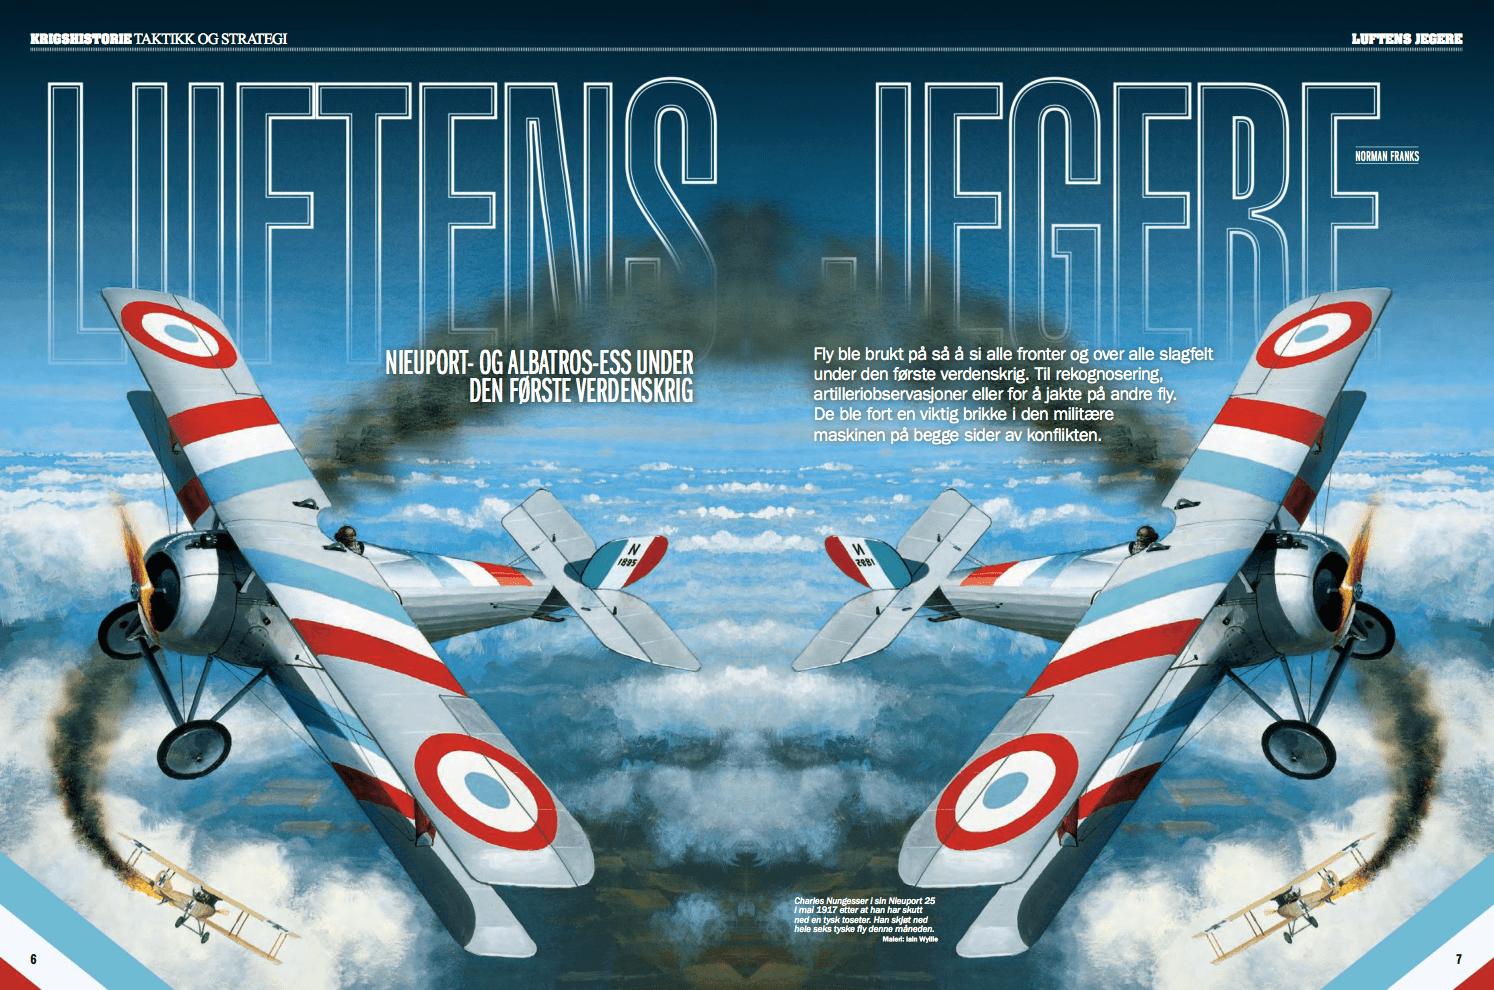 Luftens krigere: Nieuport- og Albatros-ess under Den første verdenskrig, oppslag